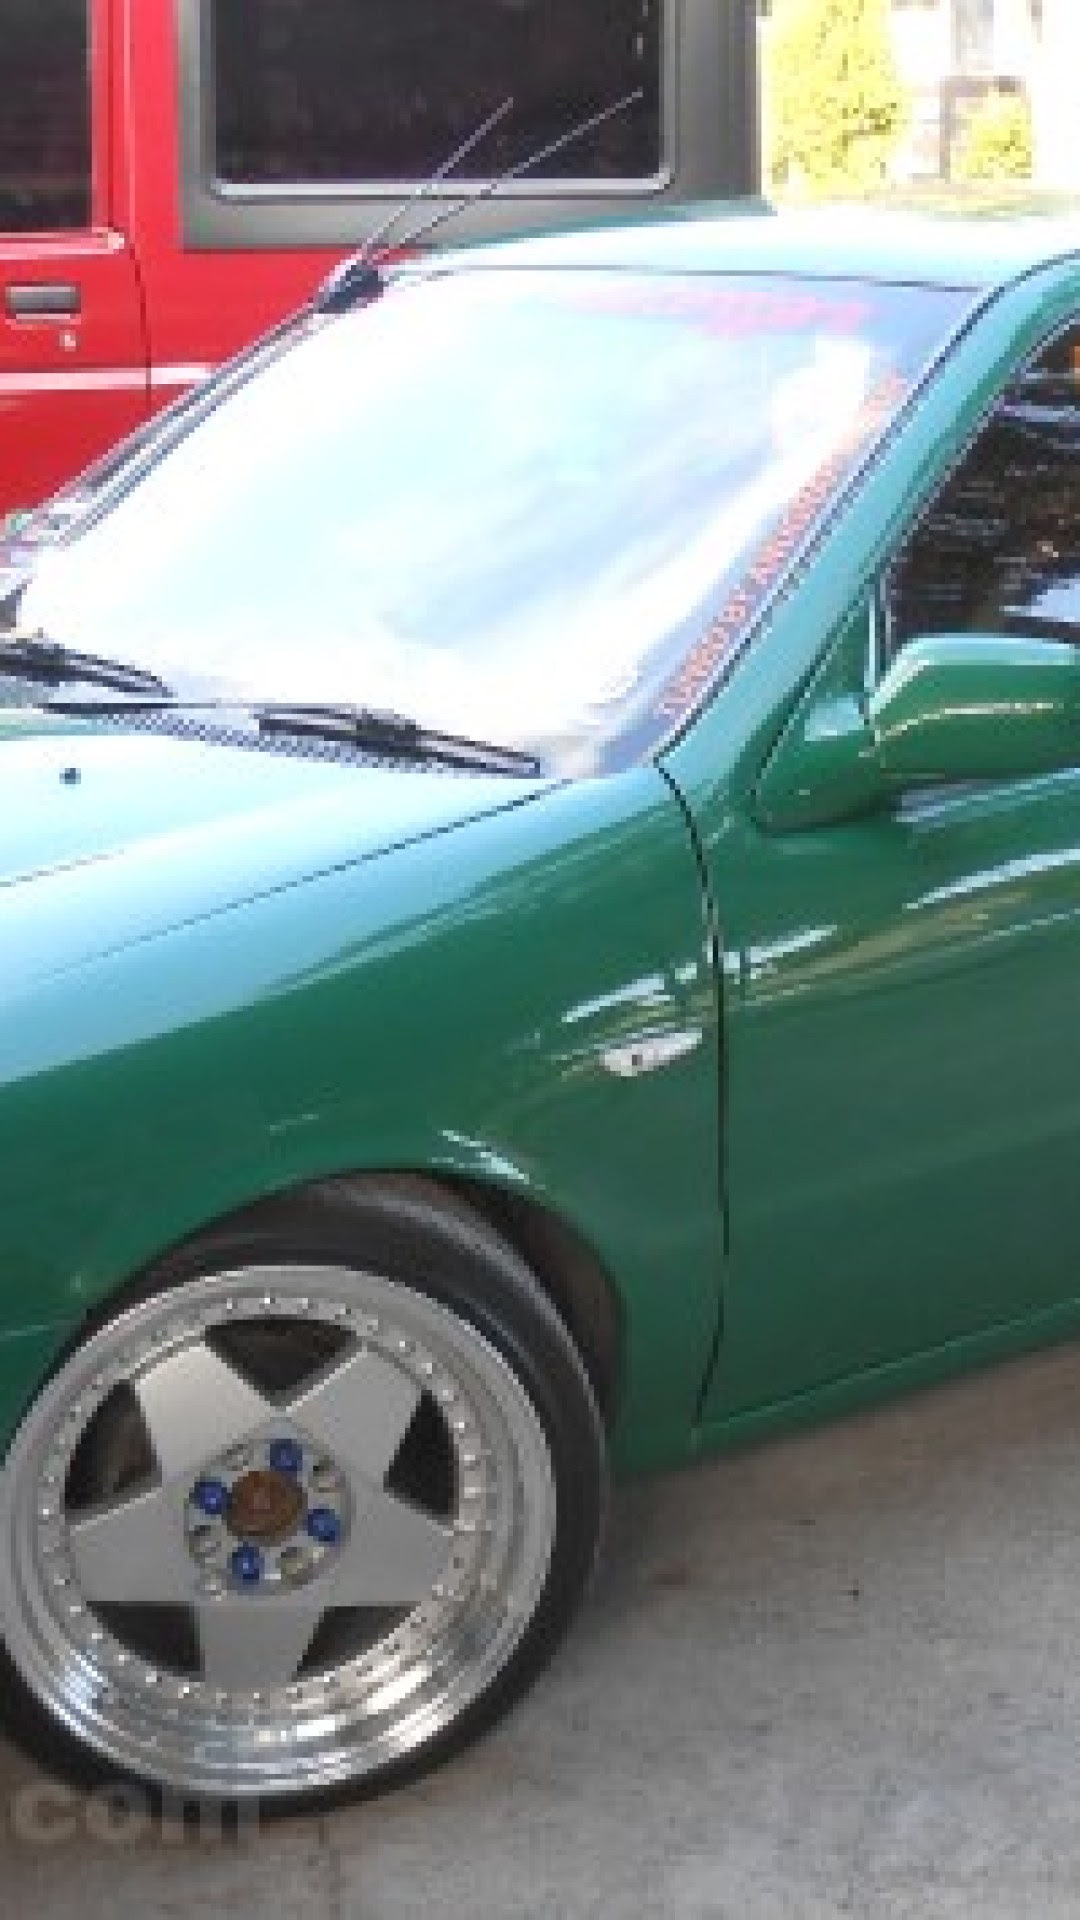 Kumpulan Modifikasi Mobil Sedan Warna Hijau Ragam Modifikasi